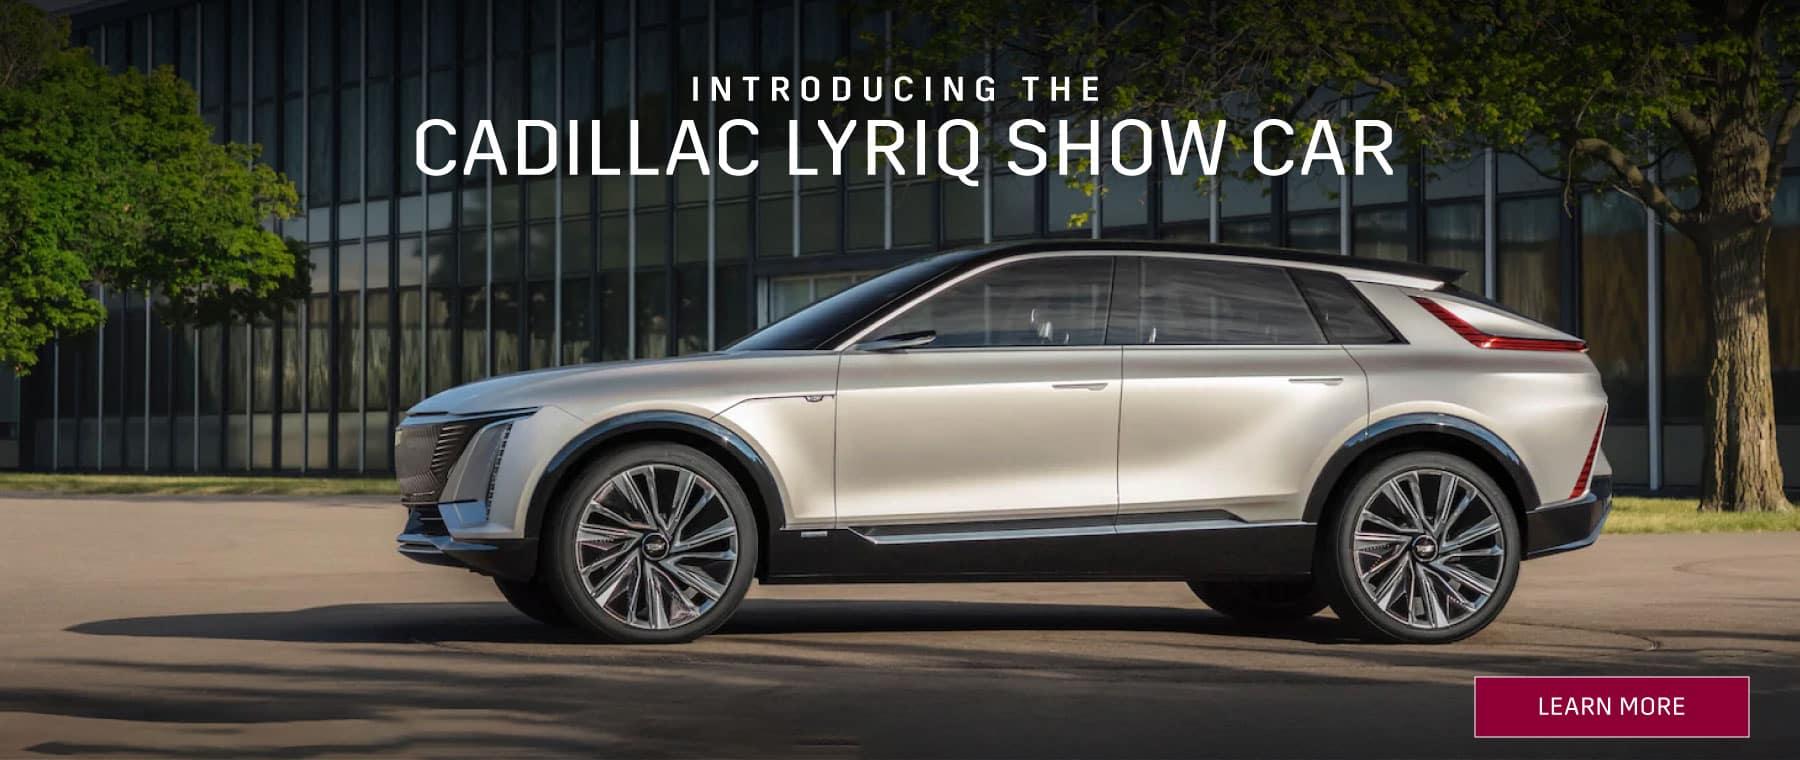 Cadillac-Lyriq-Slide